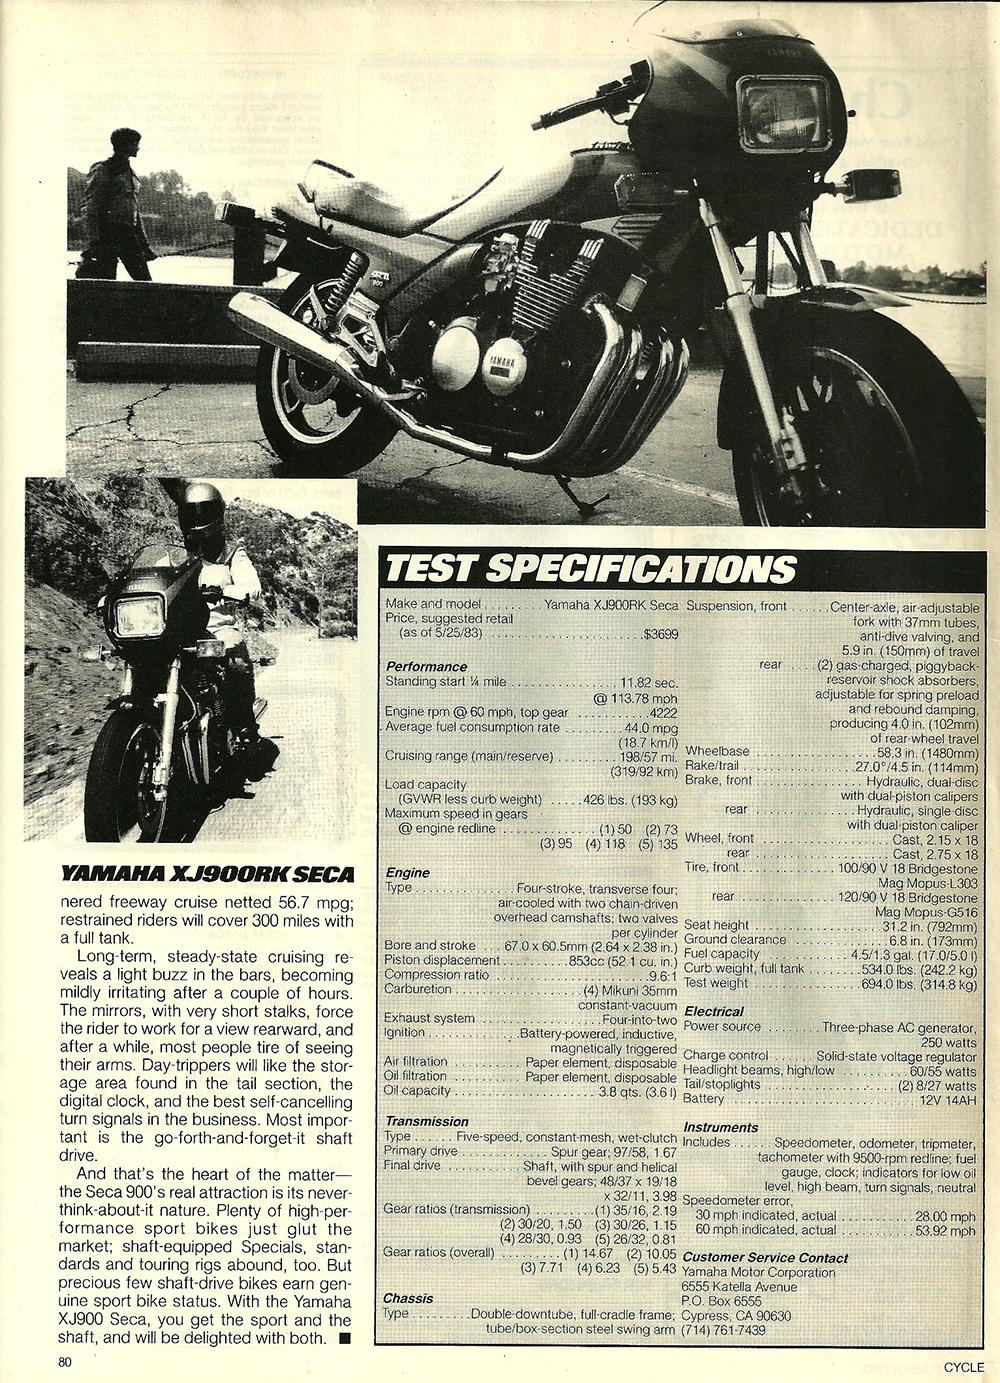 1983 Yamaha XJ900RK Seca road test 7.jpg